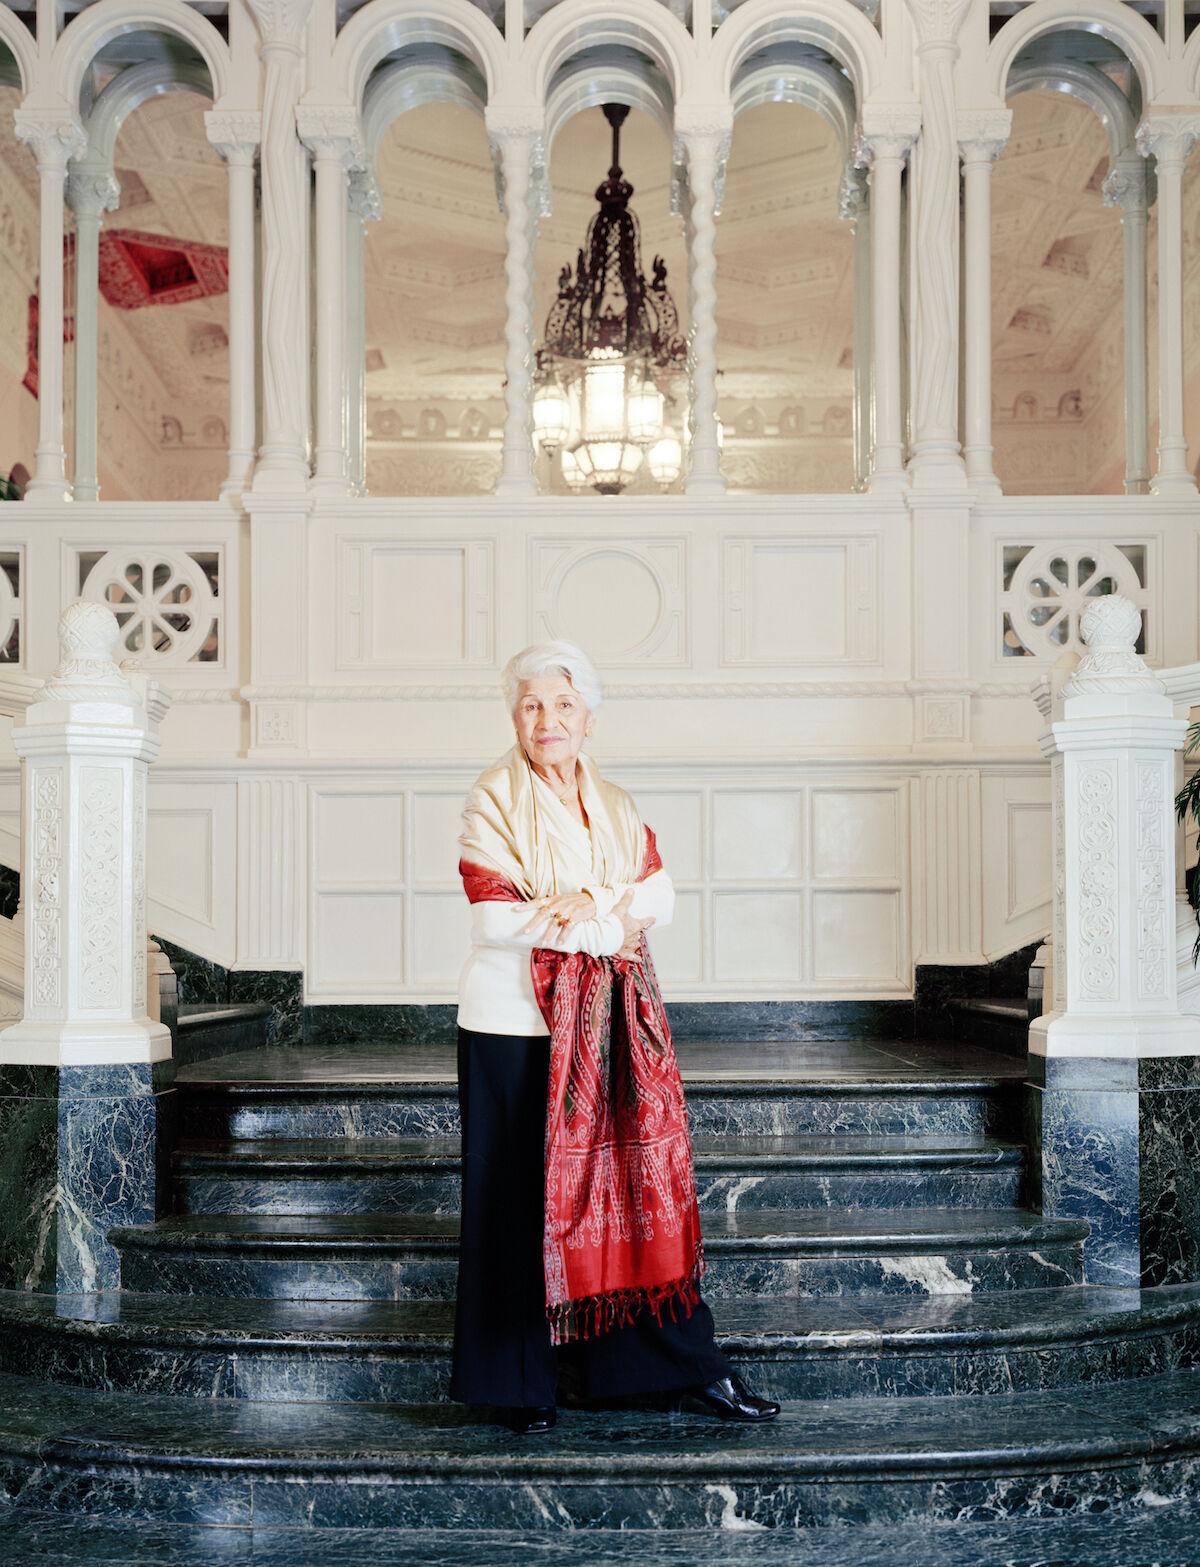 Monir Farmanfarmaian in the lobby of her apartment building, New York, 2010. Photo by Curtis Hamilton, courtesy Haines Gallery.